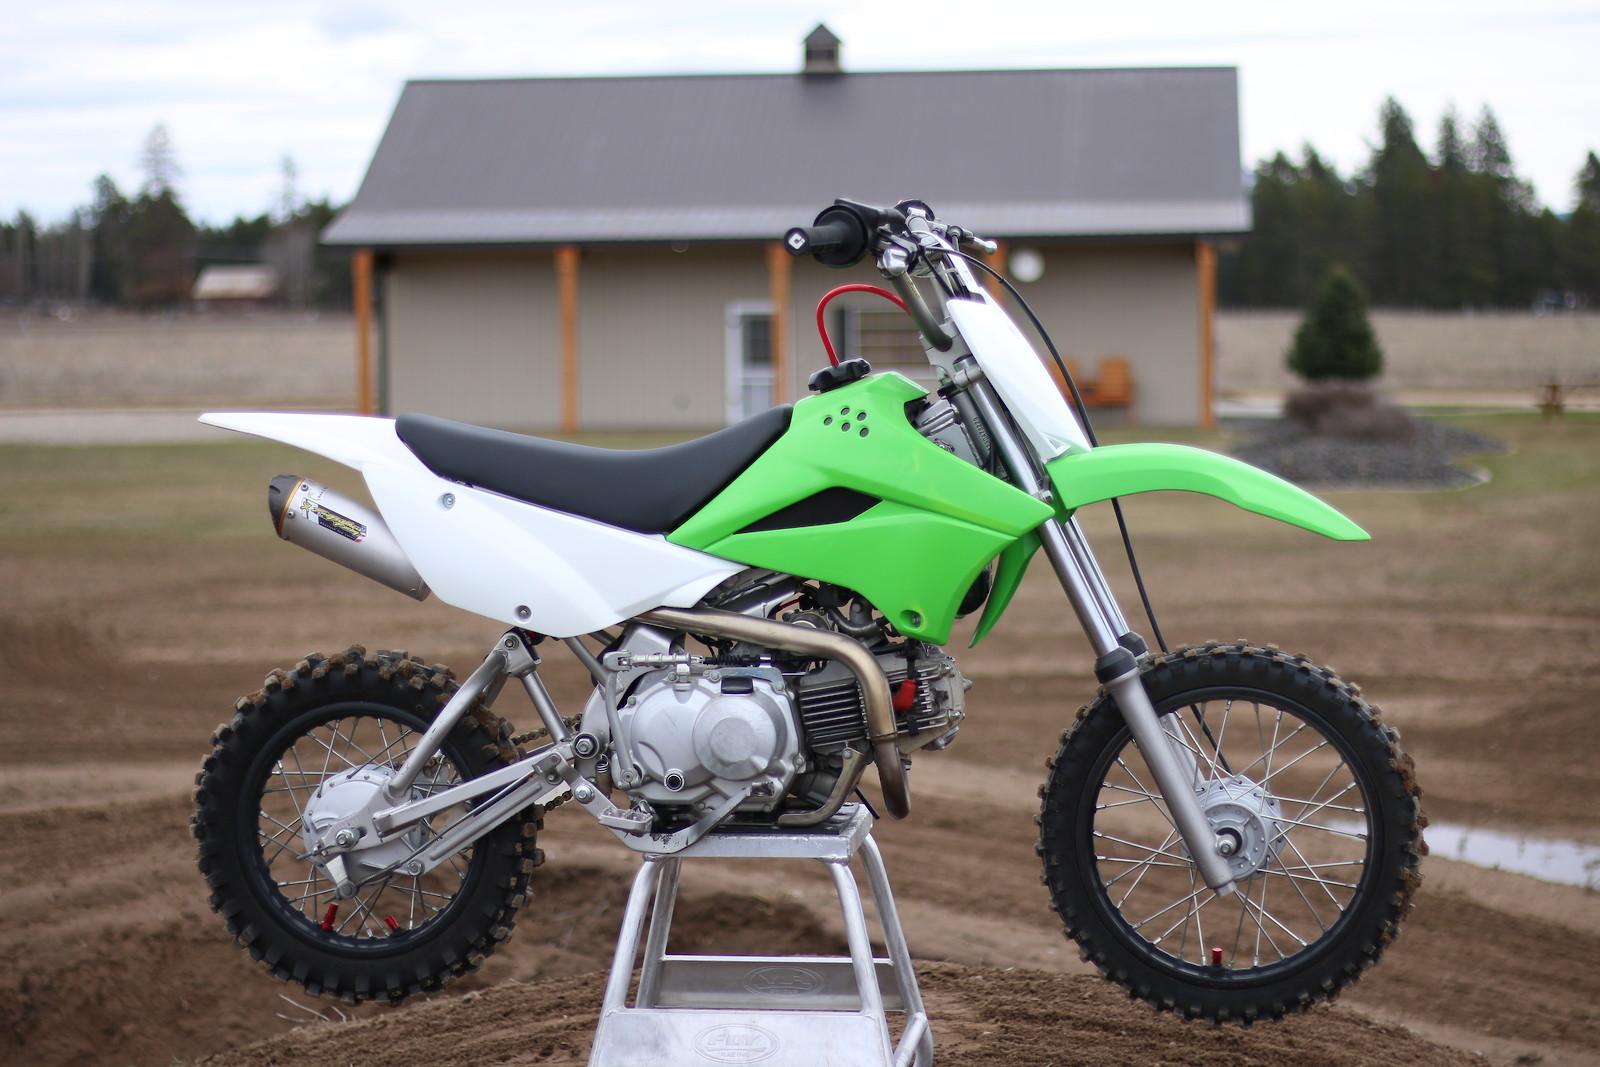 KLX110L - Cameron Niemela - Motocross Pictures - Vital MX